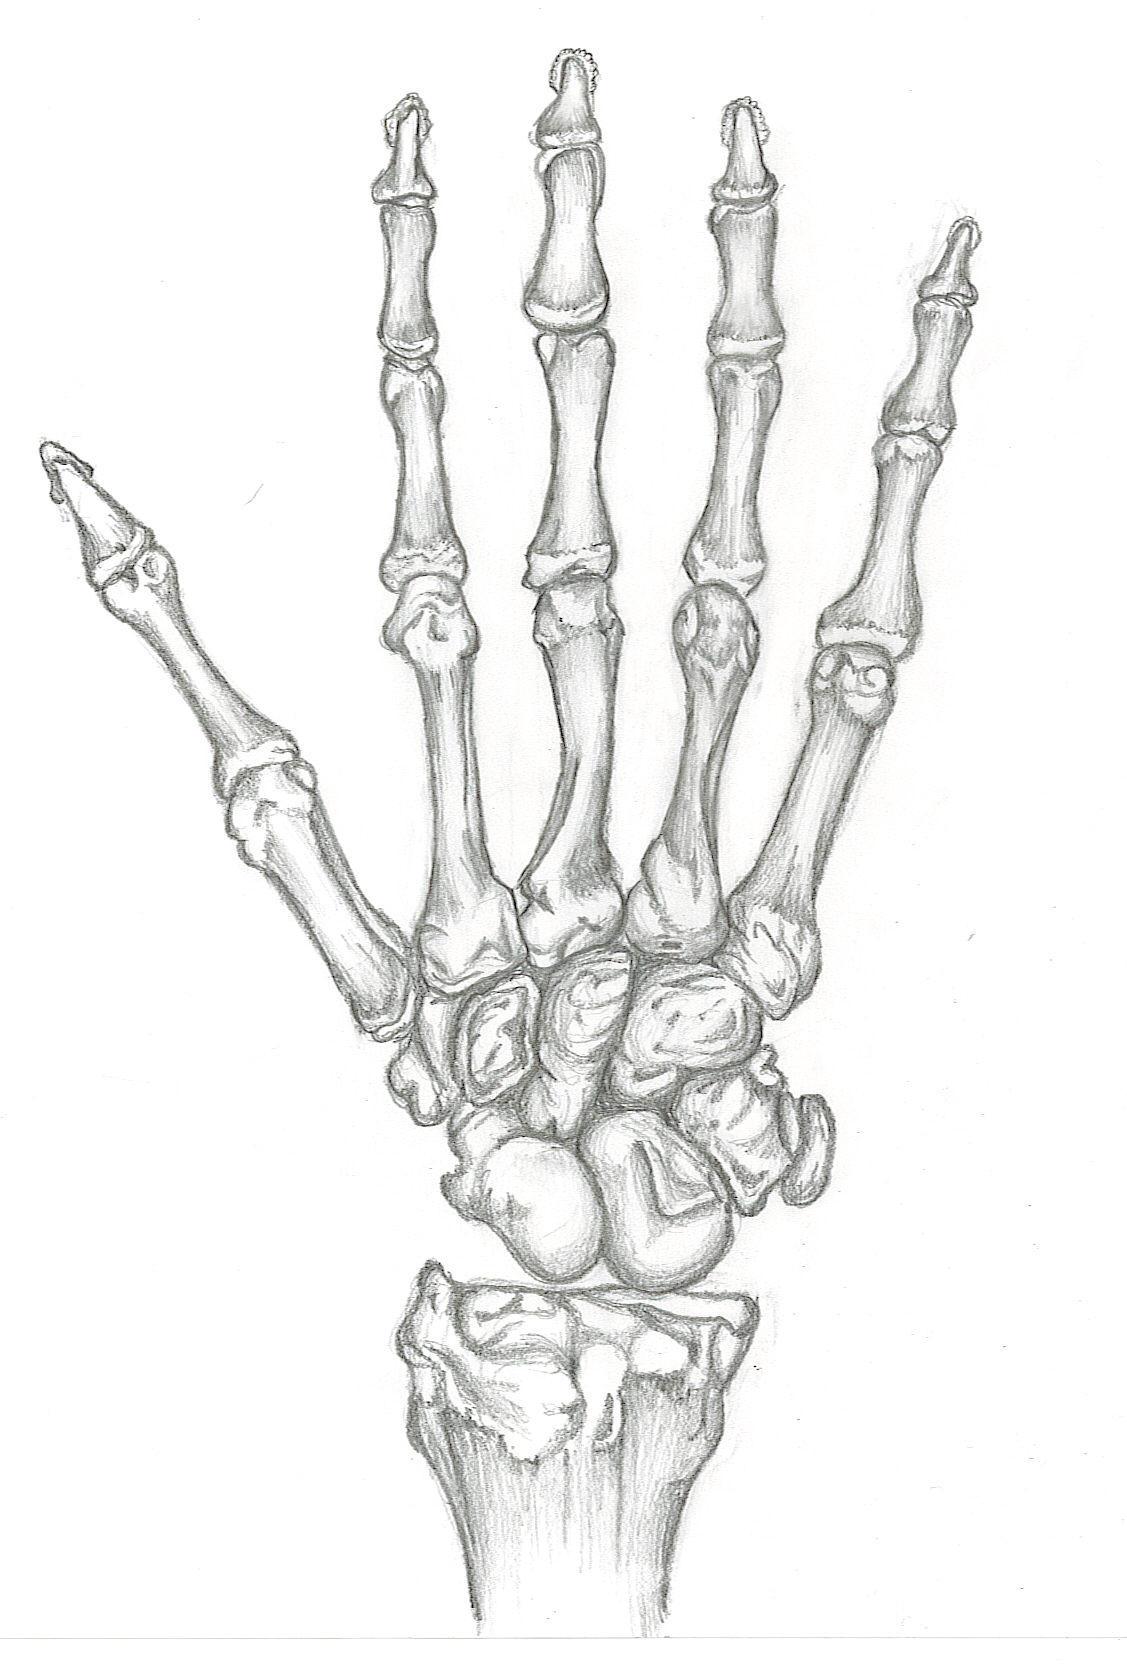 Study of Skeleton Hand by SkeletonOfARose on DeviantArt